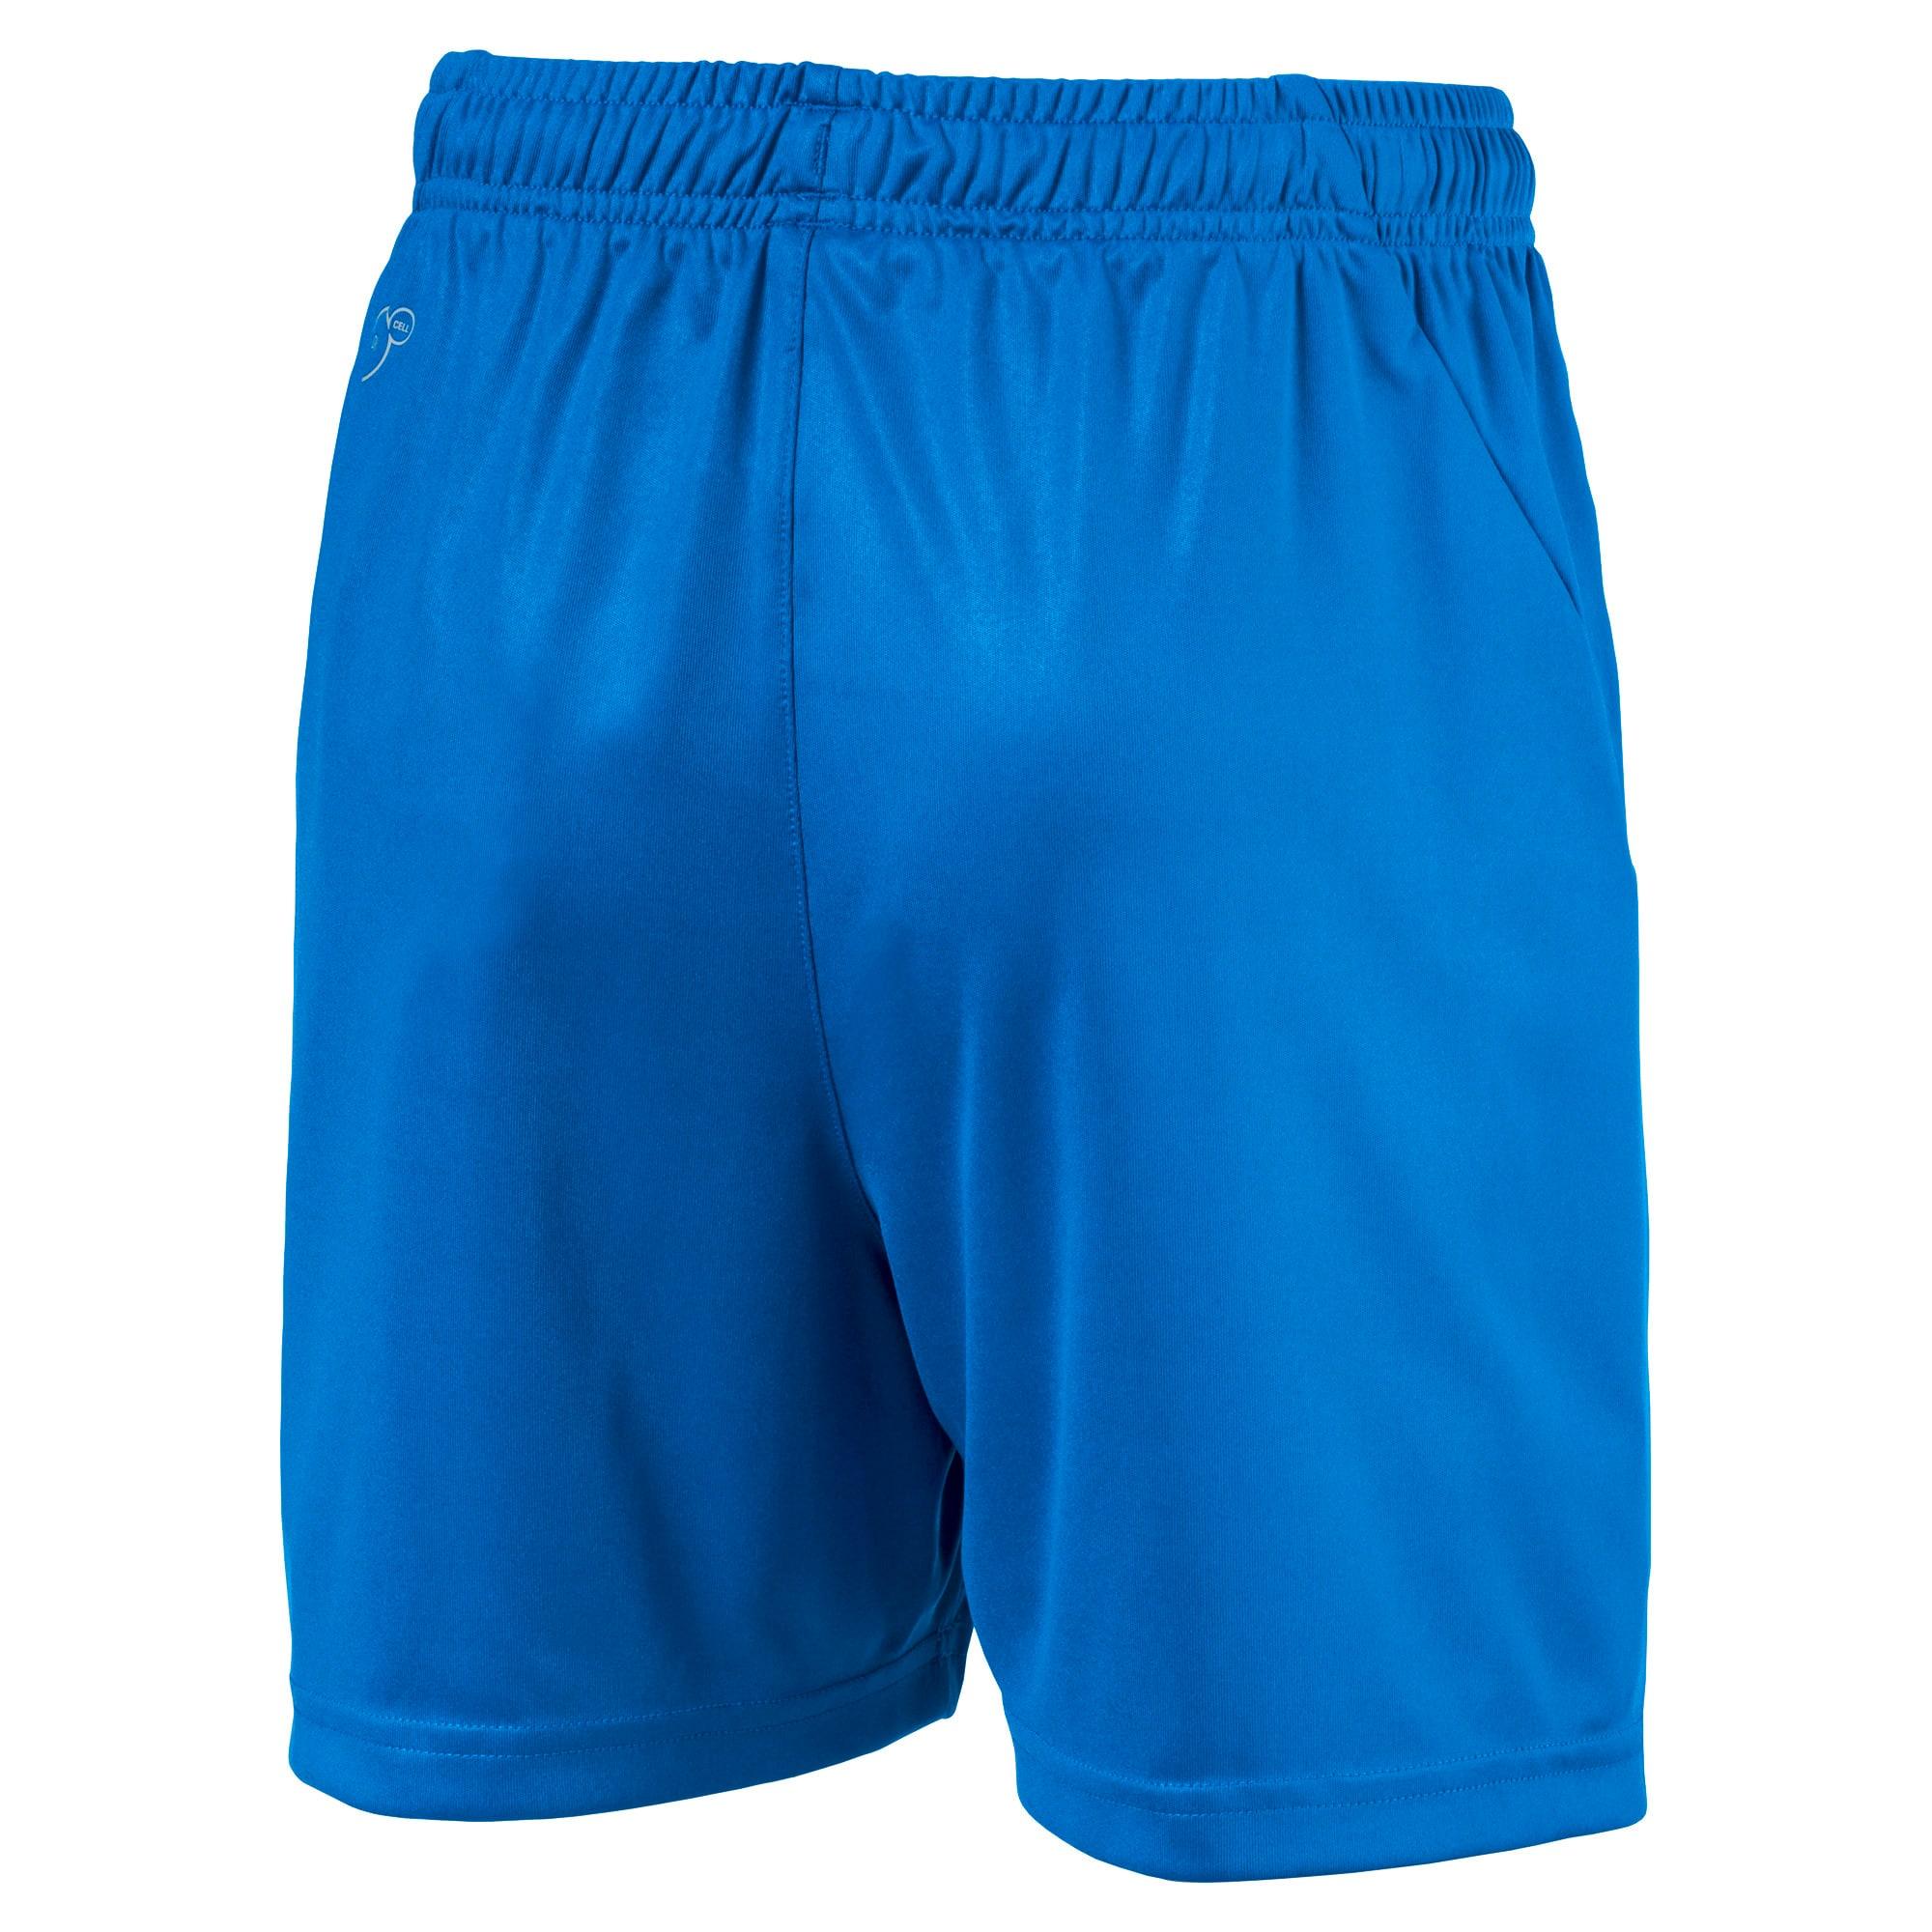 Thumbnail 2 of Liga Core Junior Football Shorts, Electric Blue Lemonade-White, medium